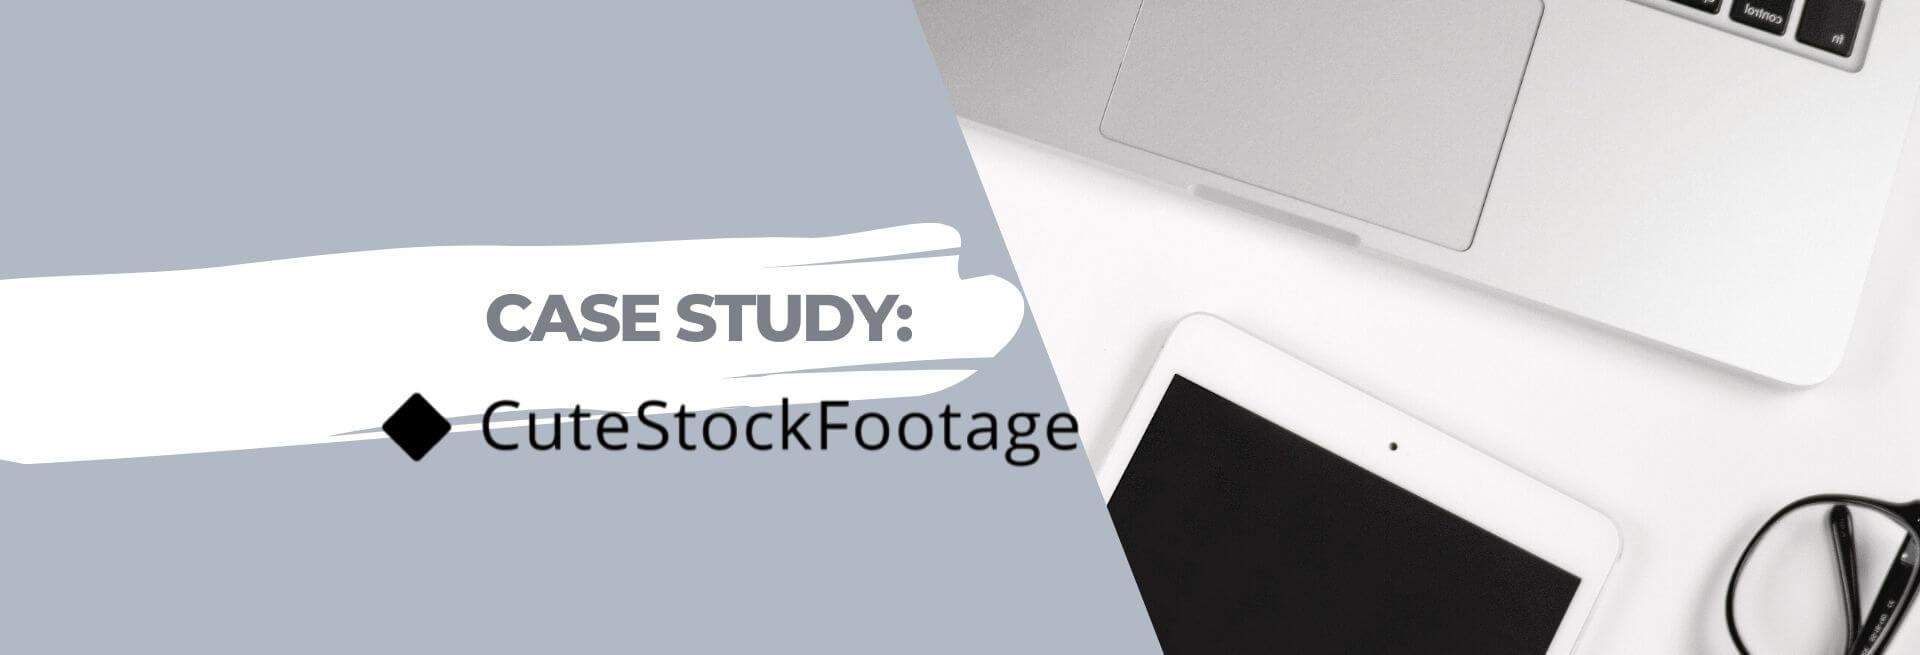 cutestockfootage | Case study by Setupad